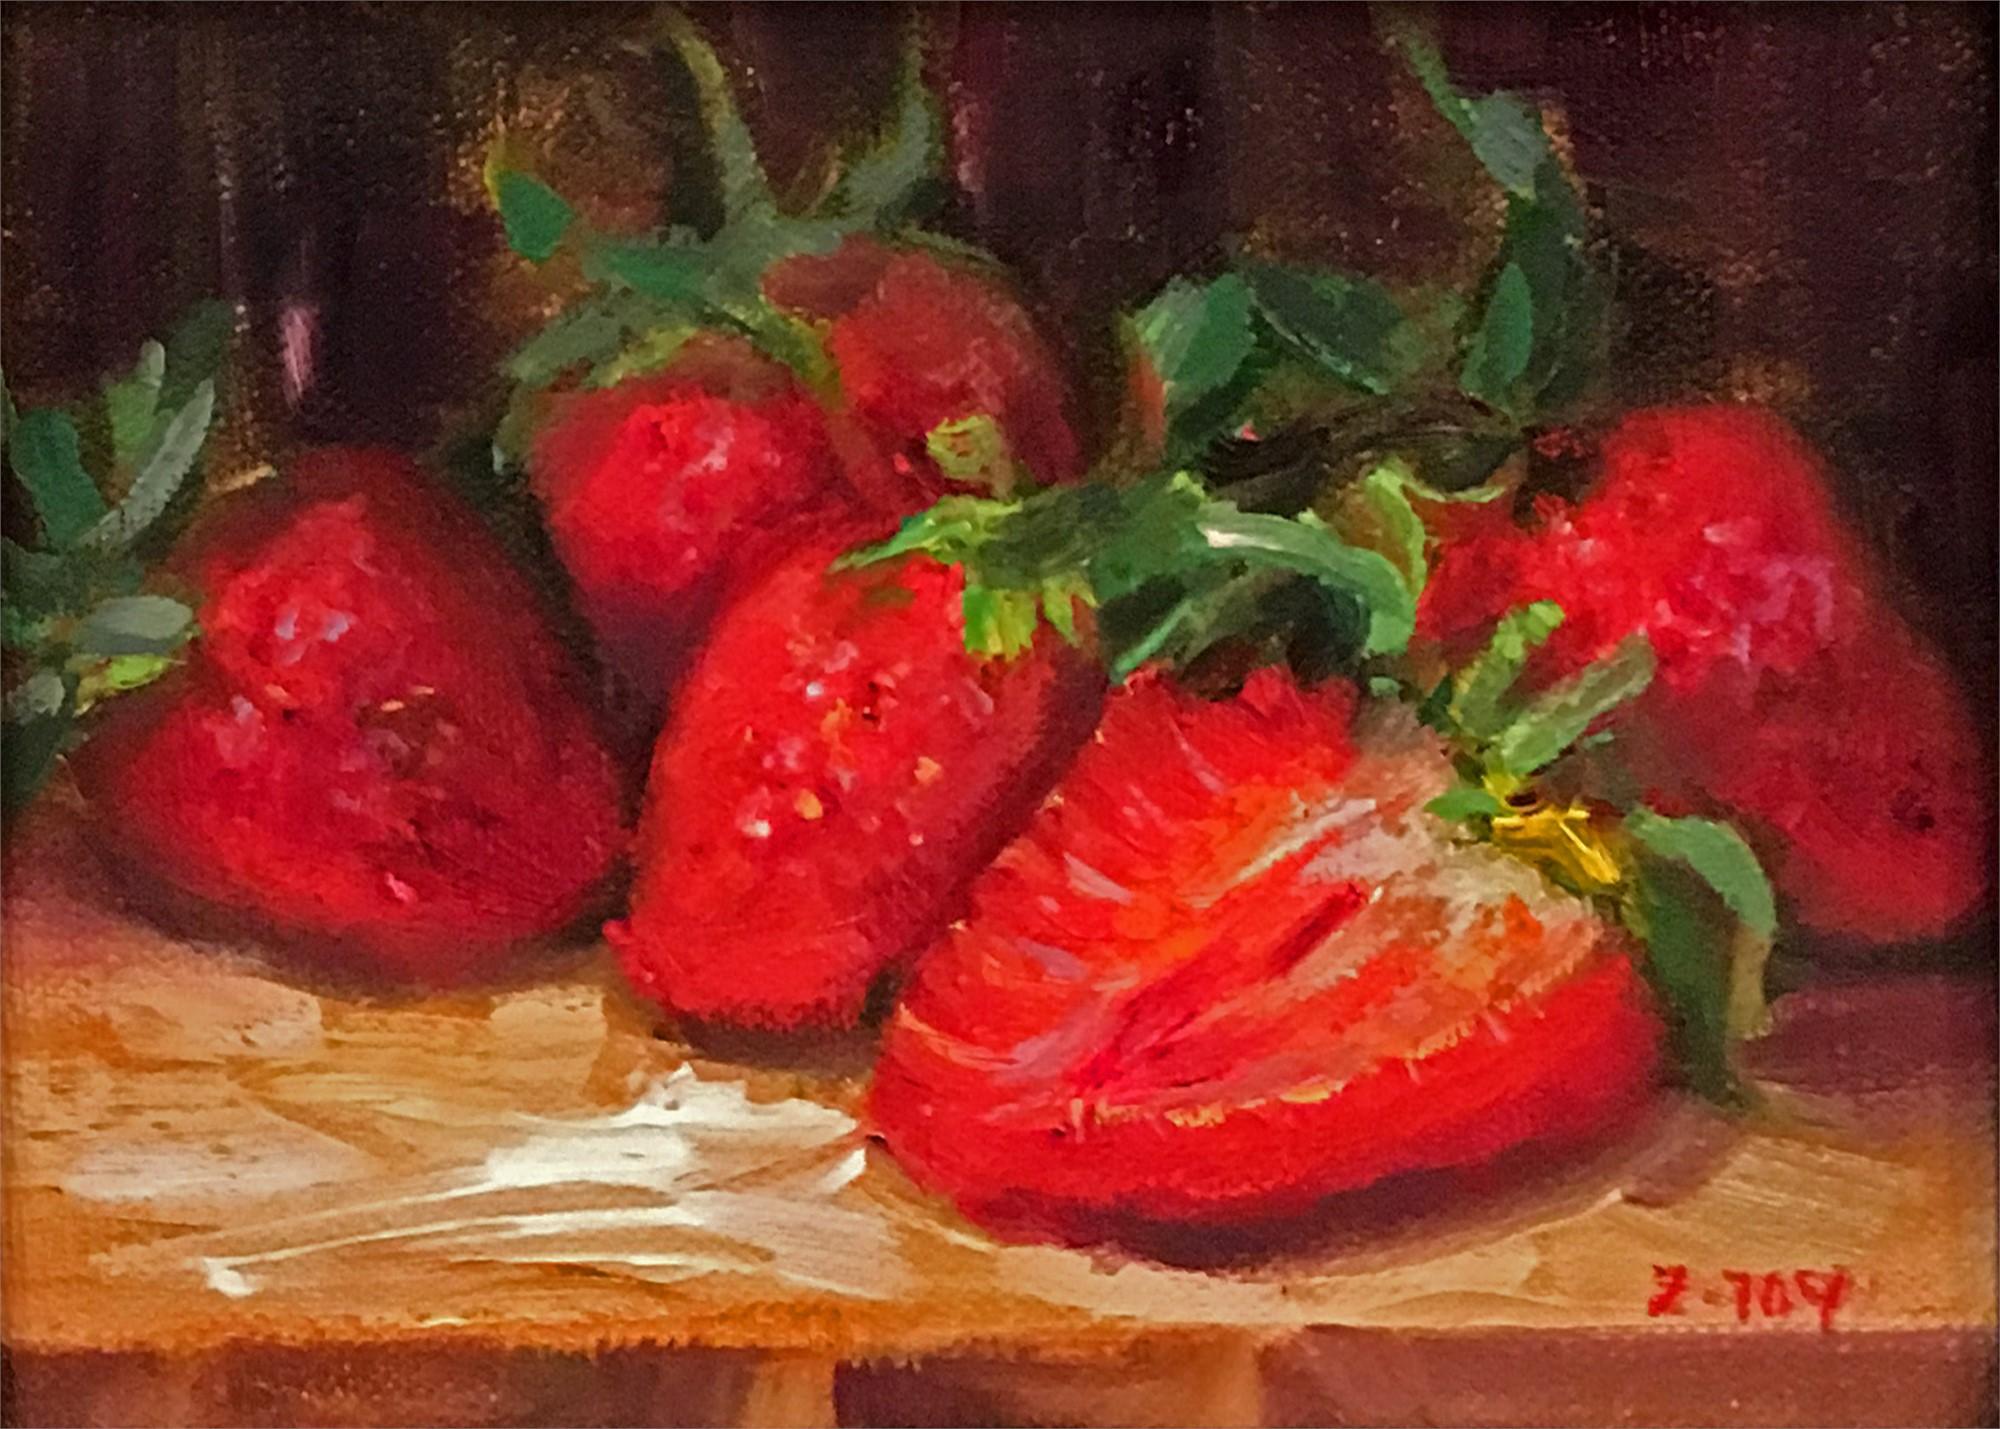 Strawberries by JOY